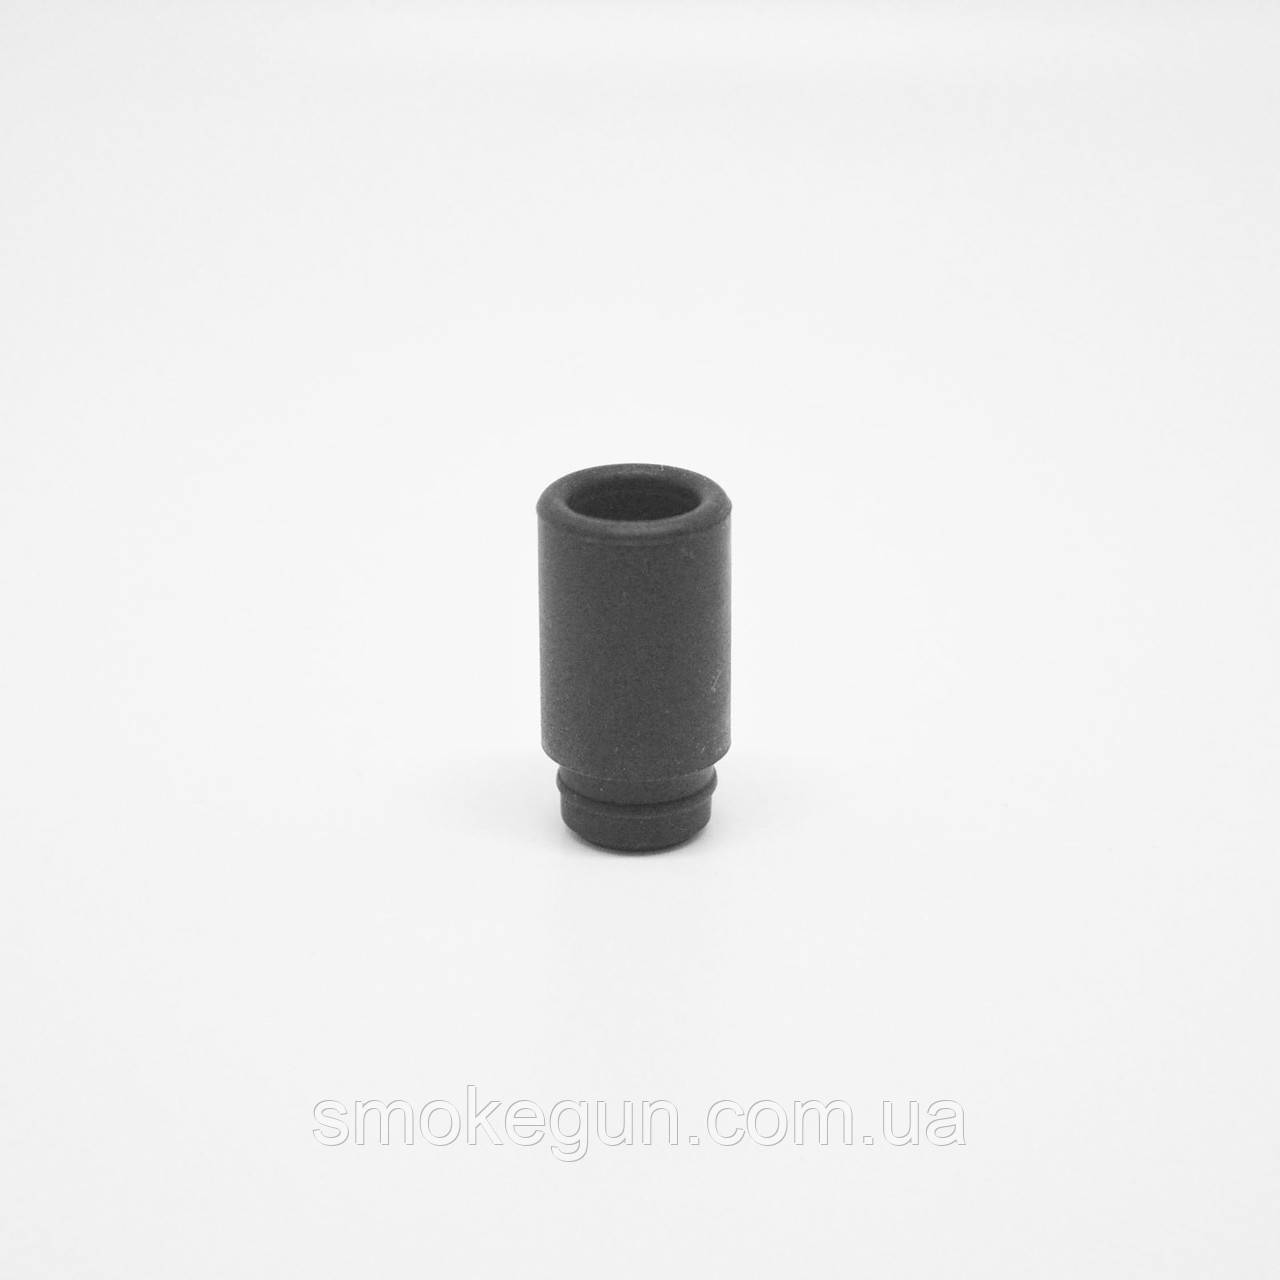 Мундштук (drip tip) 510 Силикон